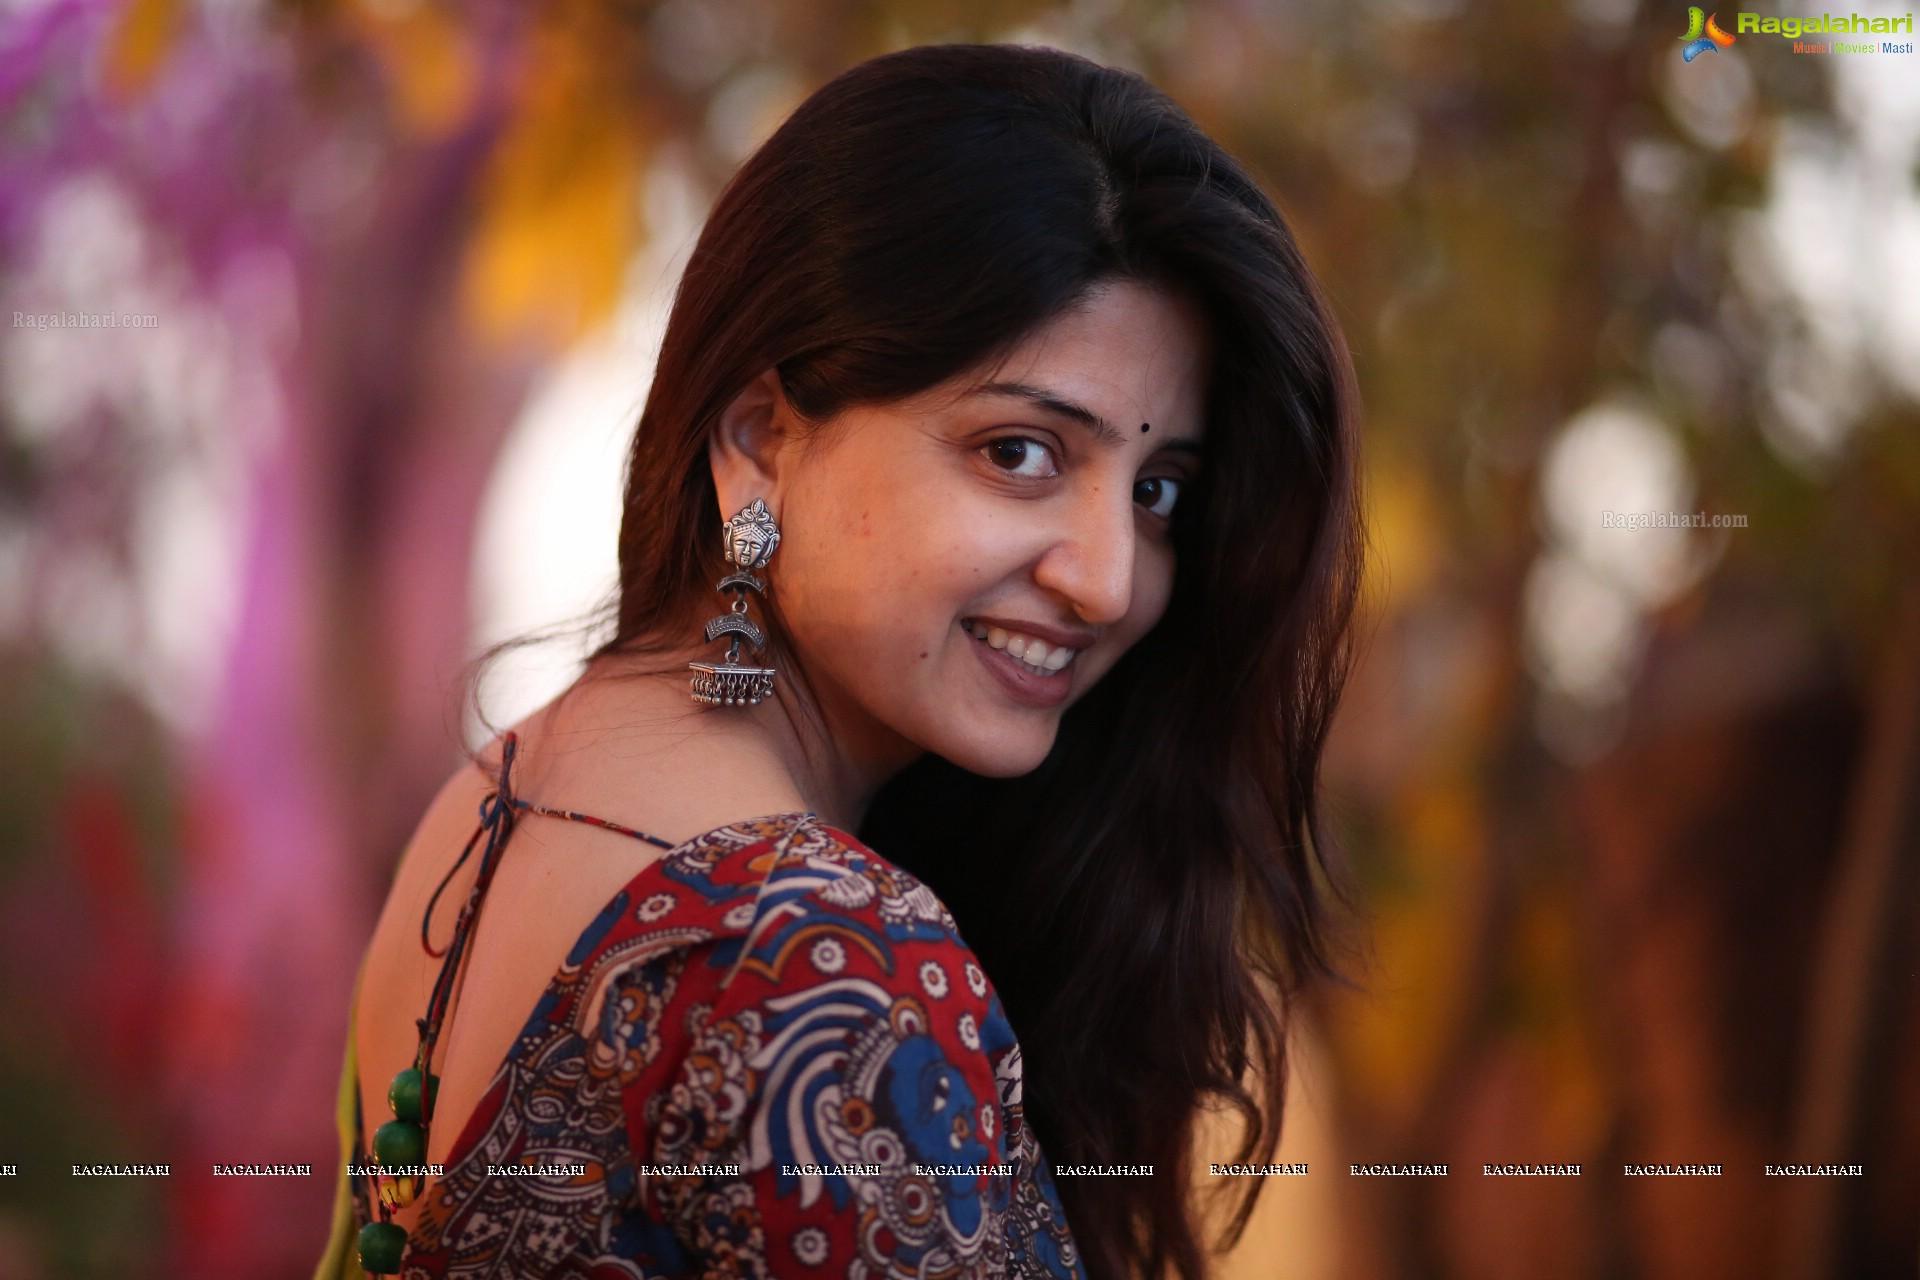 poonam kaur lal (high definition) image 19 | telugu actress hot